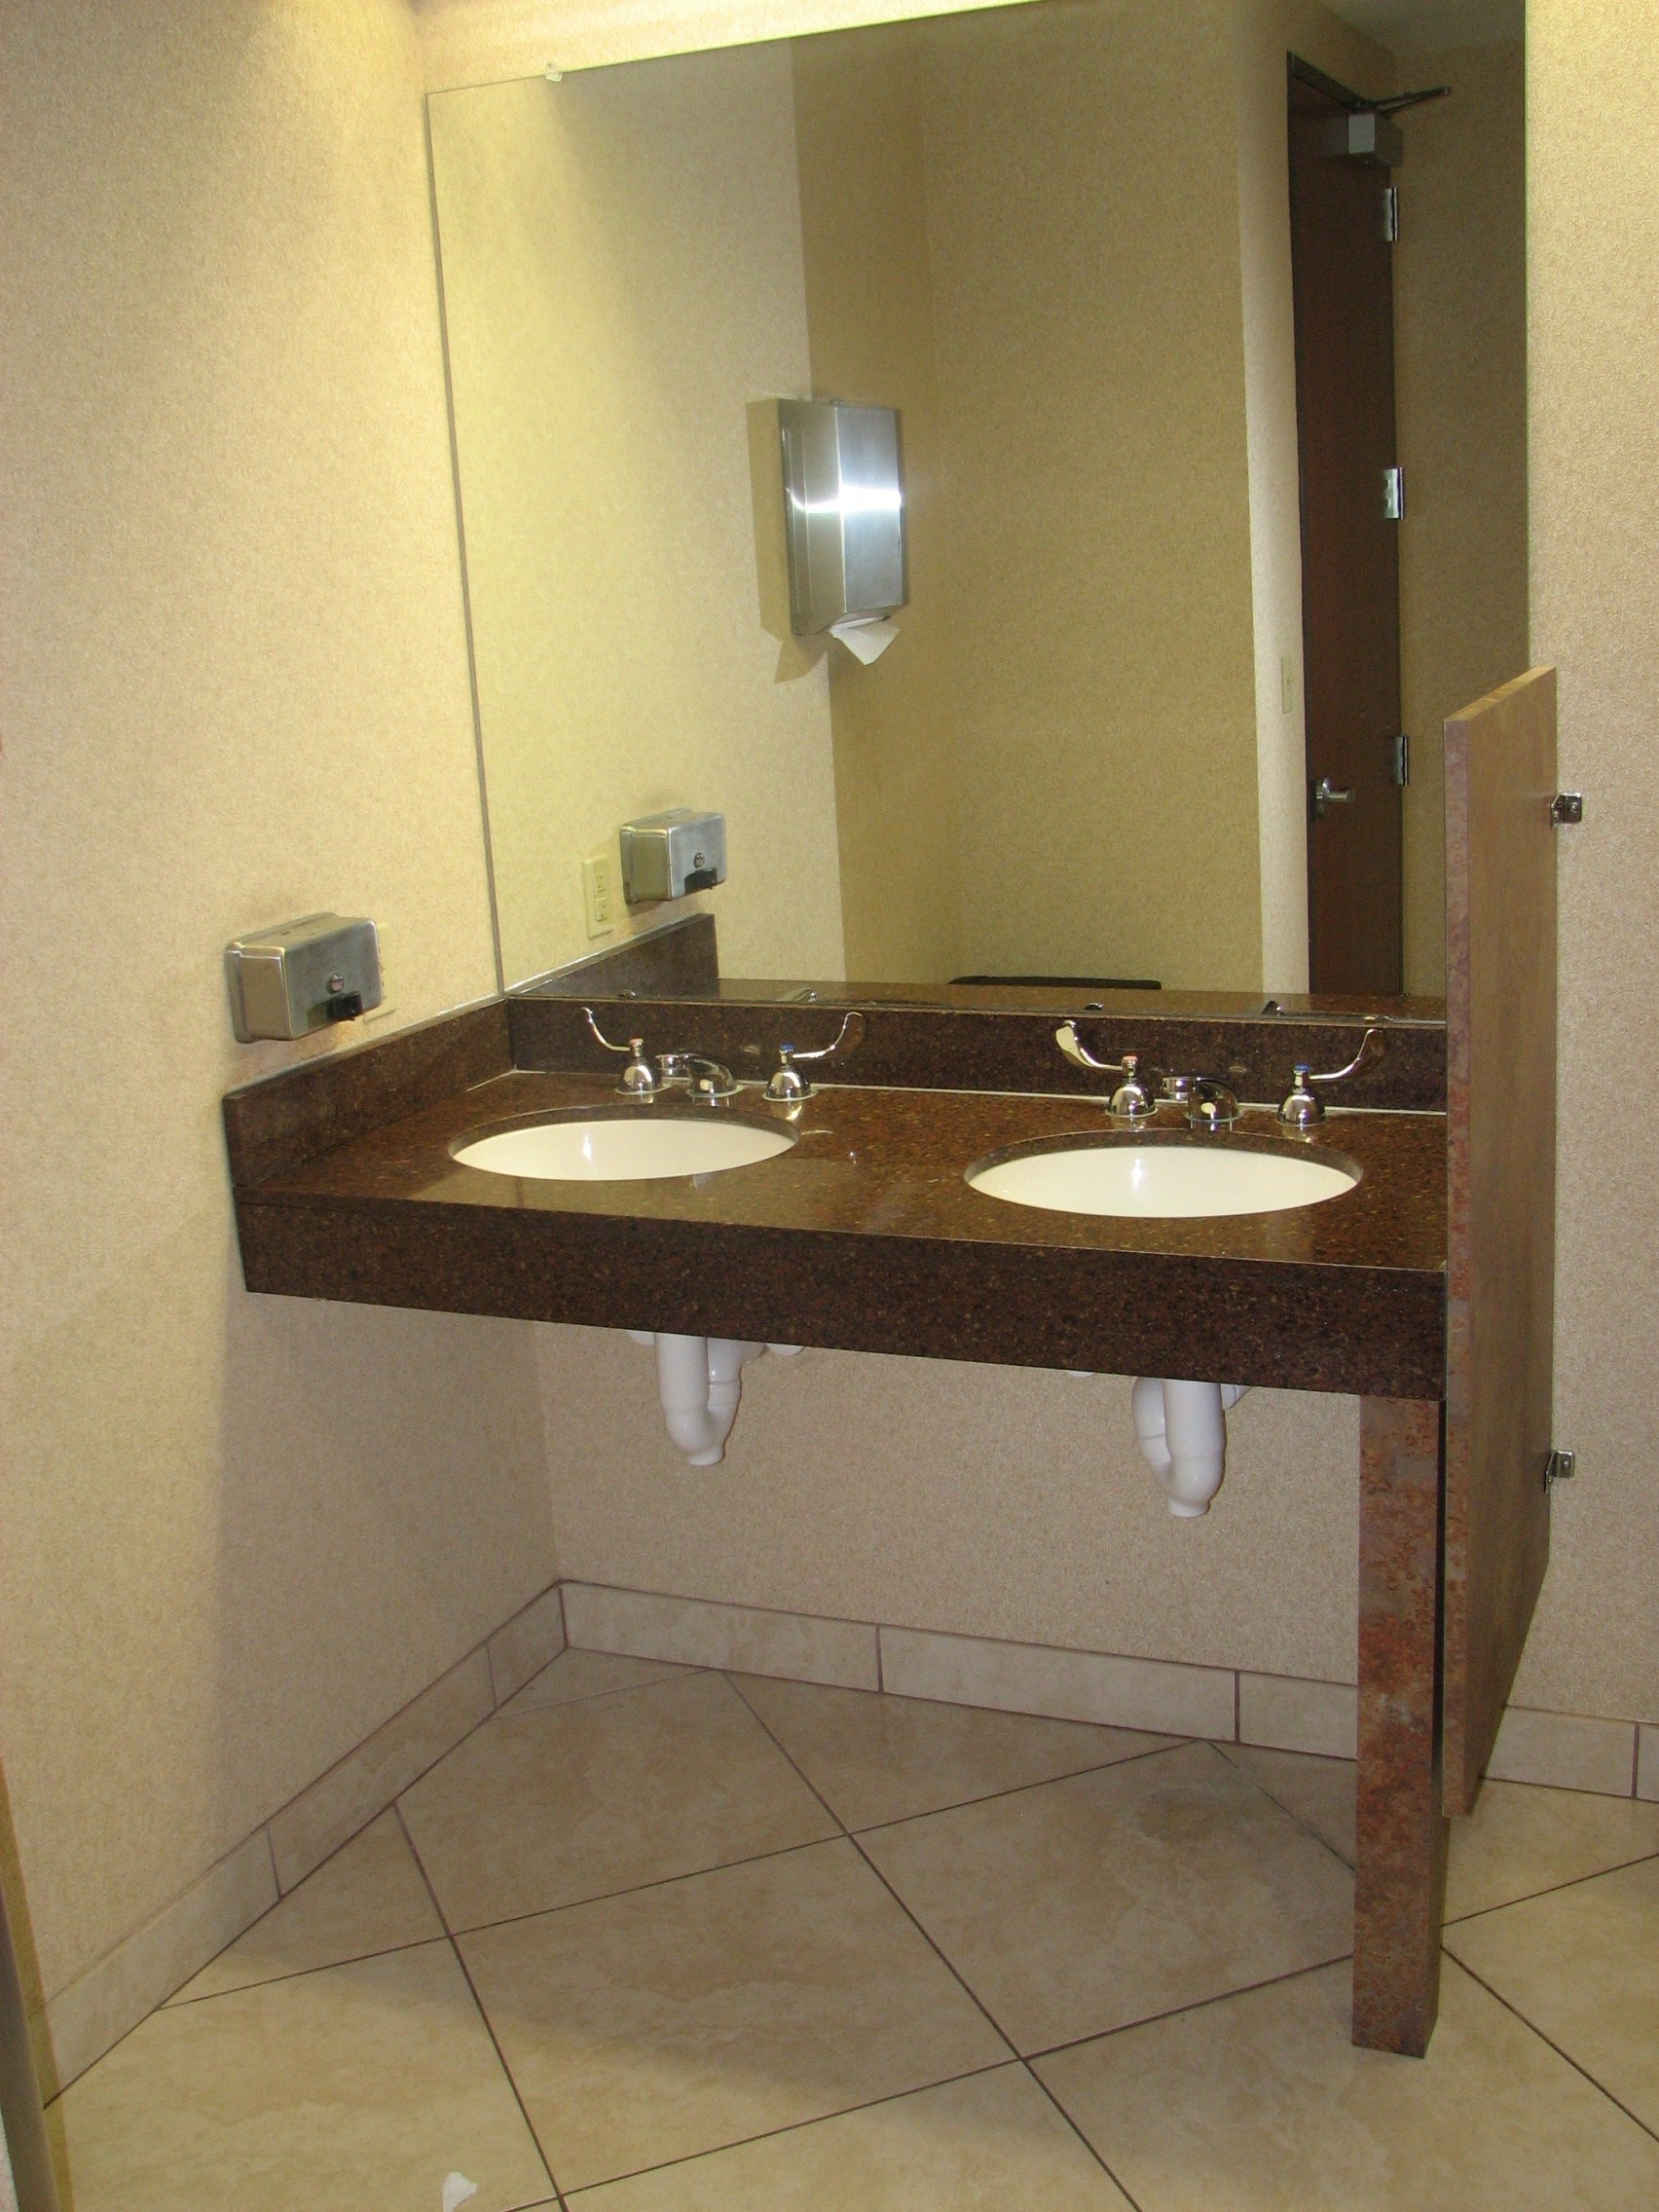 Bathroom Remodeling Austin commercial bathroom remodeling in austin